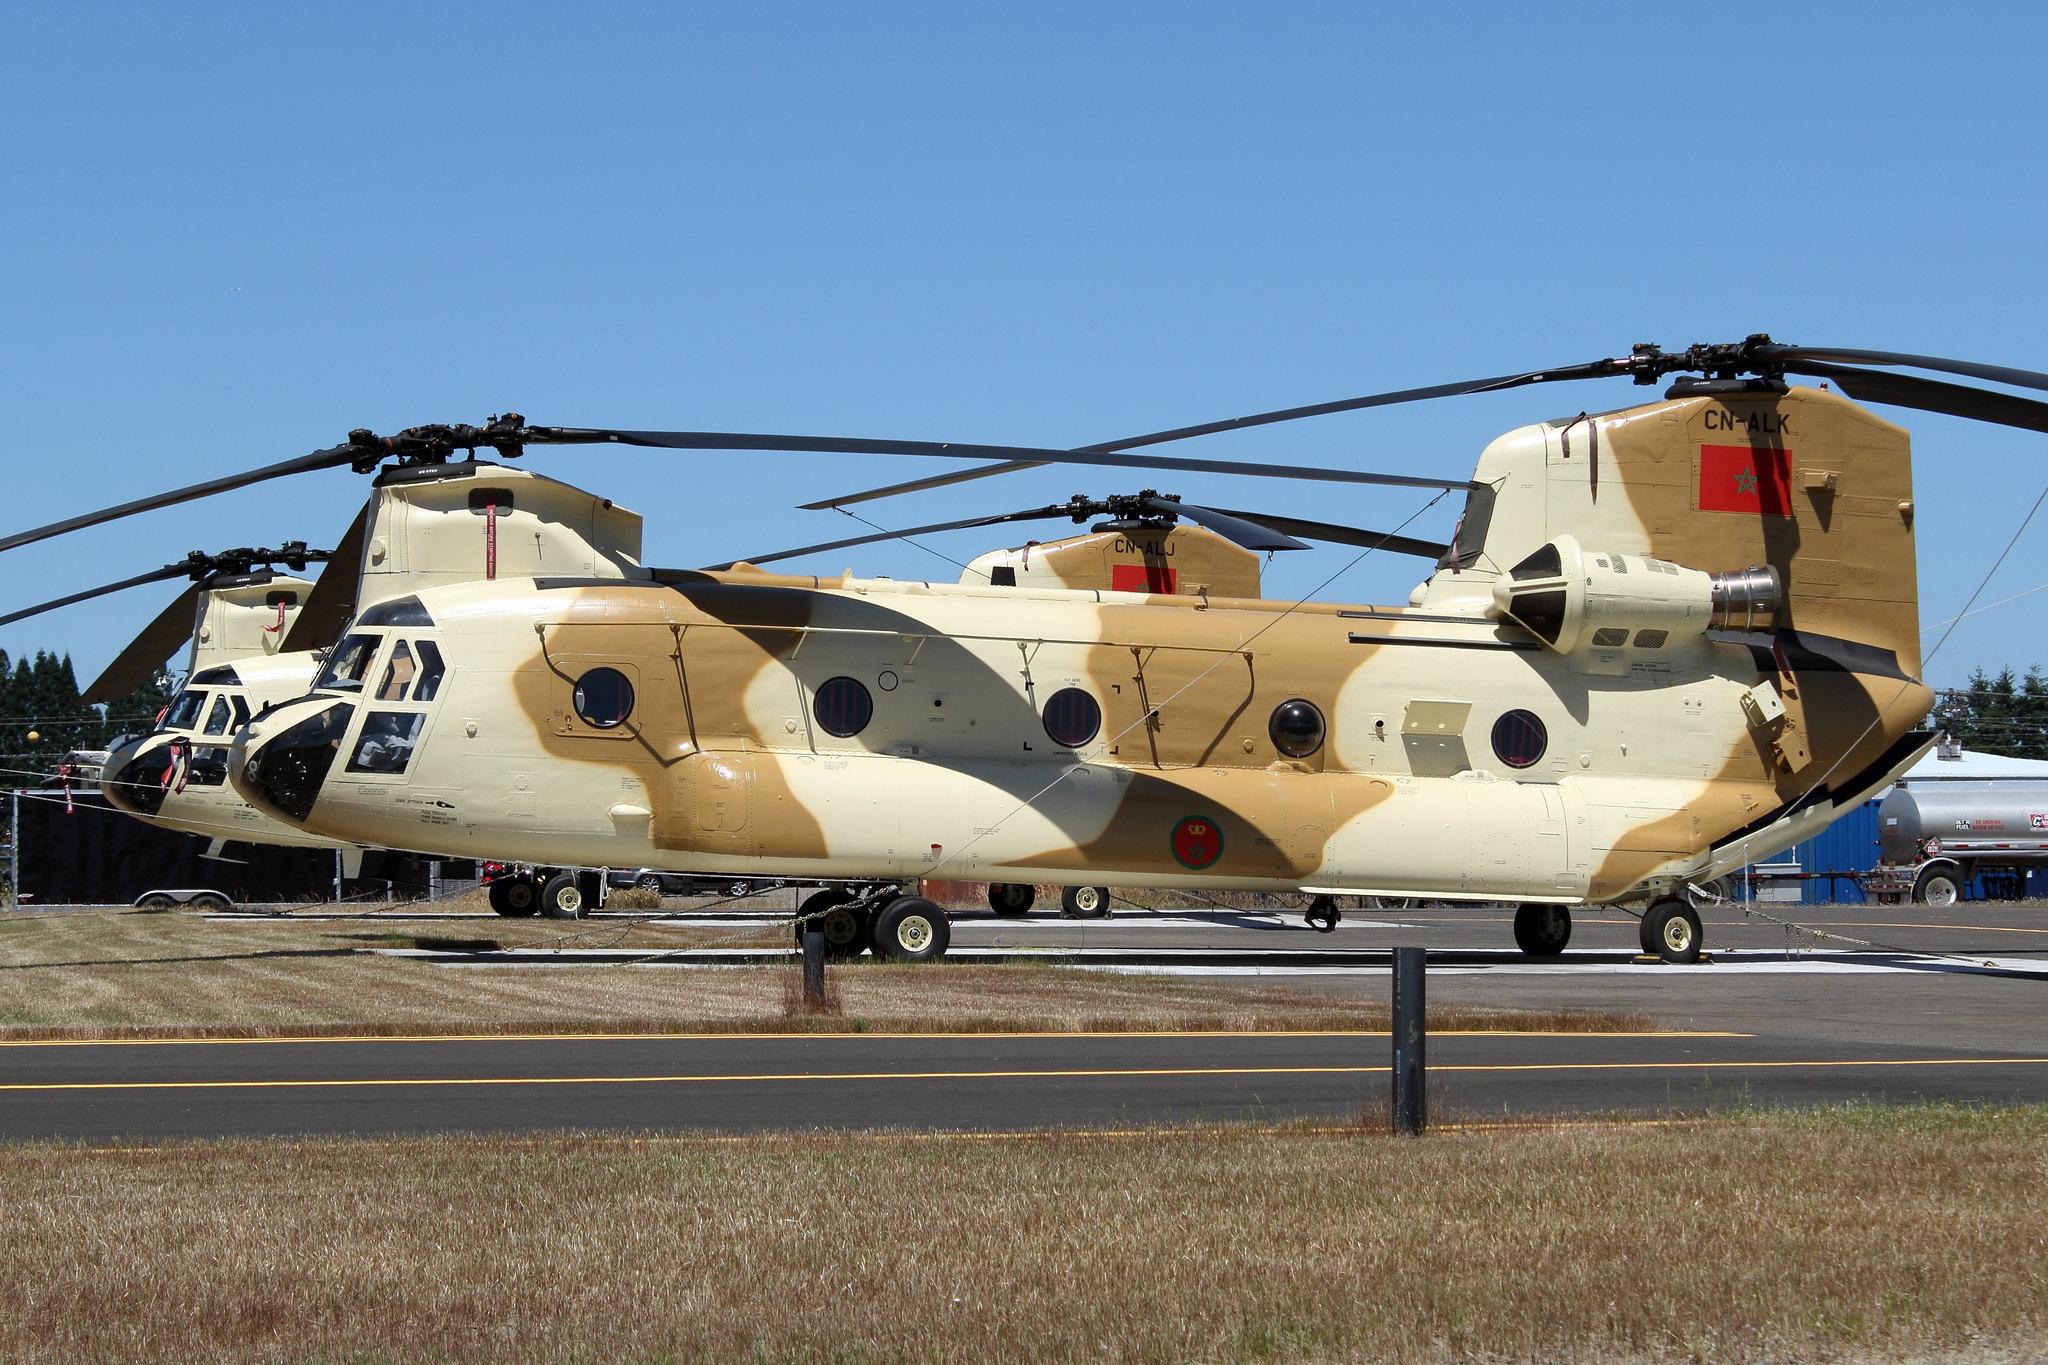 CH-47D CHINOOK des Forces Royales Air  19236306918_e326a35bad_k